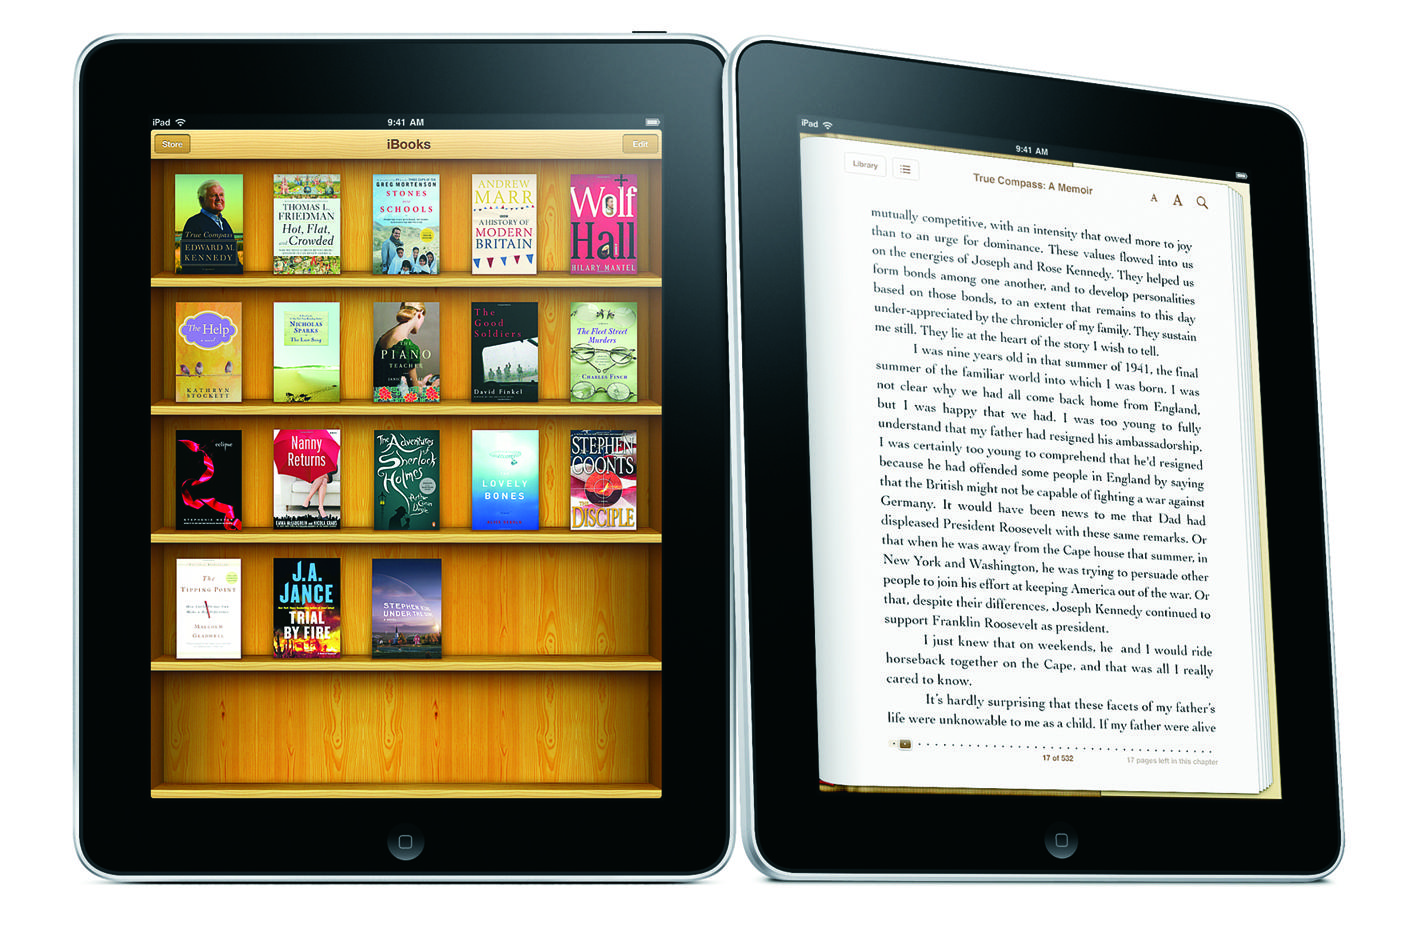 Какой формат книг для iPad